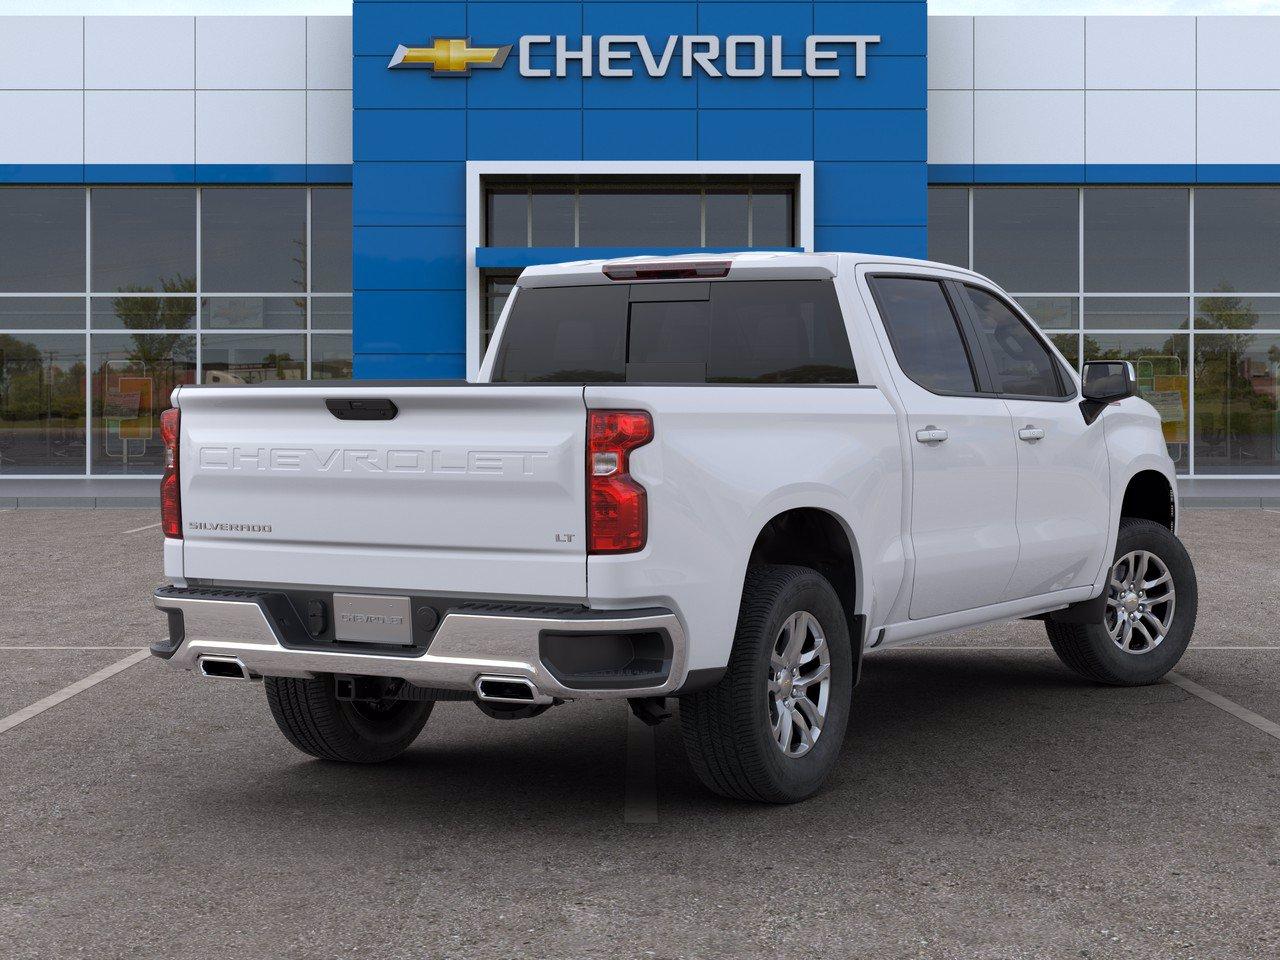 2020 Chevrolet Silverado 1500 Crew Cab 4x4, Pickup #C201413 - photo 2